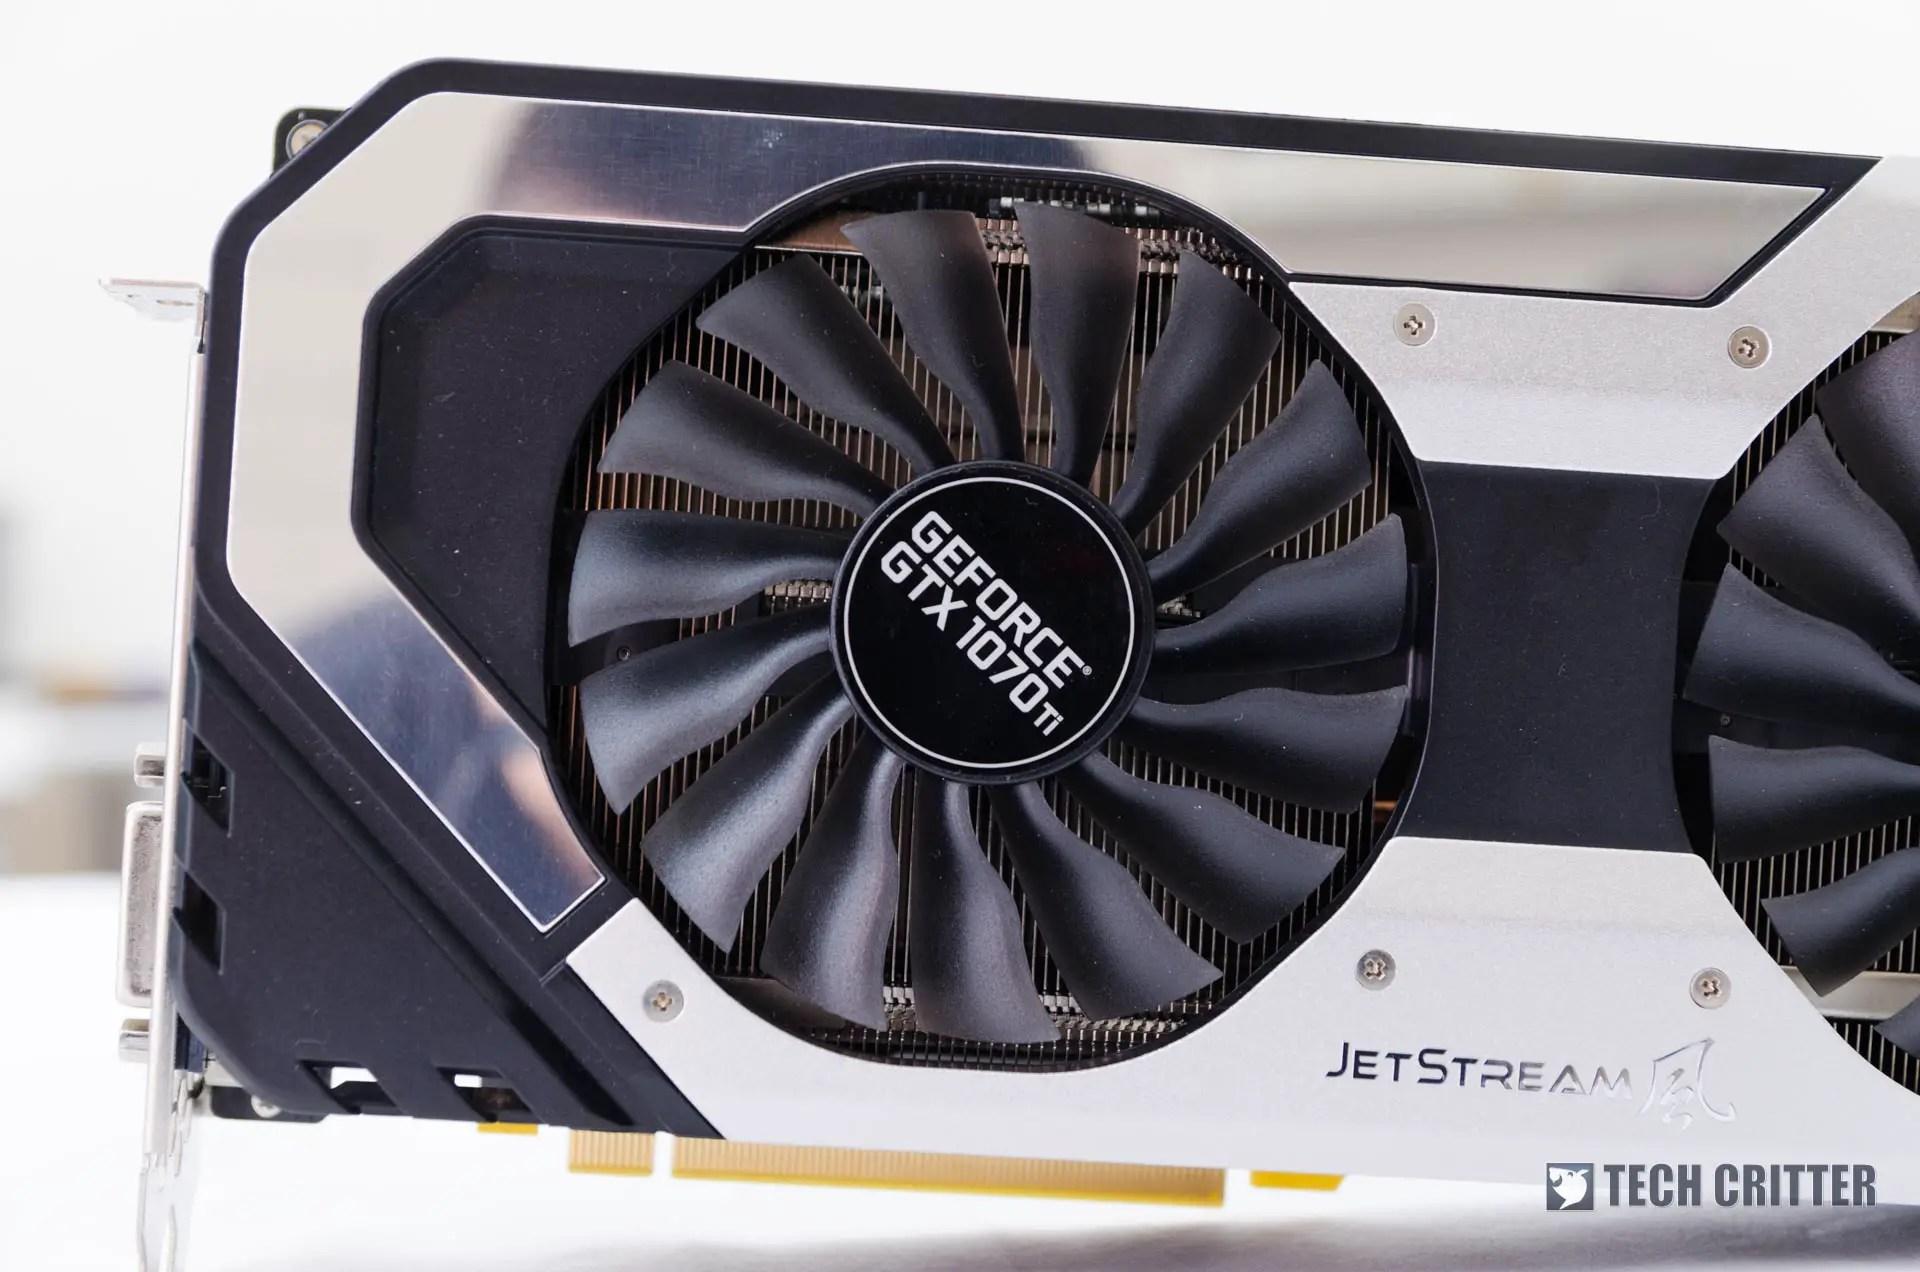 Review - Palit GeForce GTX 1070 Ti Super JetStream Edition